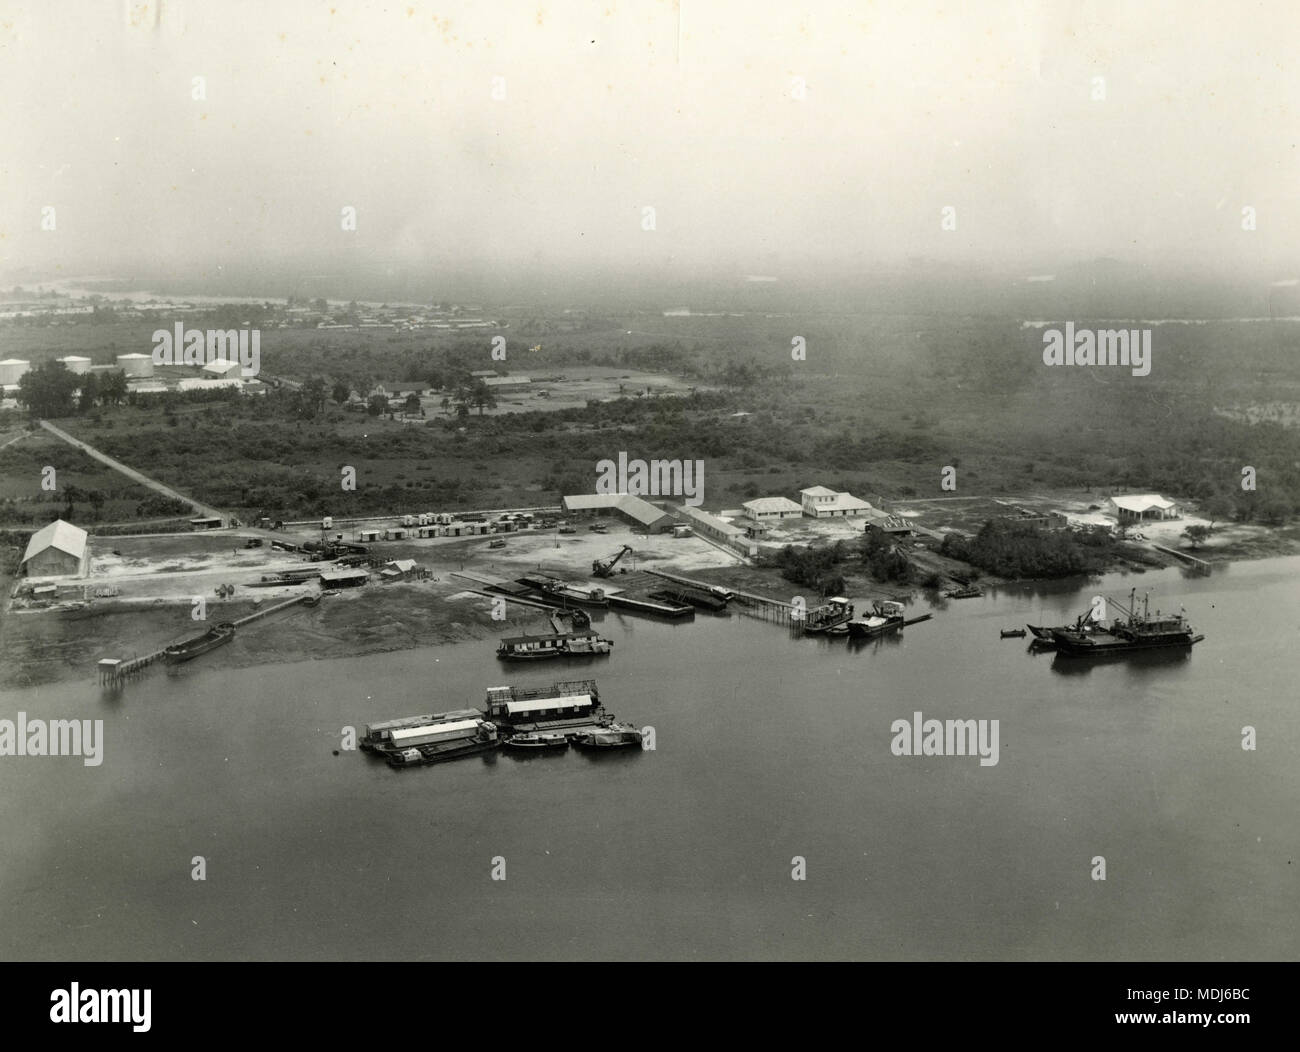 Shell-BP Petroleum Development Company water transport base, Port Harcourt, Nigeria 1950s - Stock Image